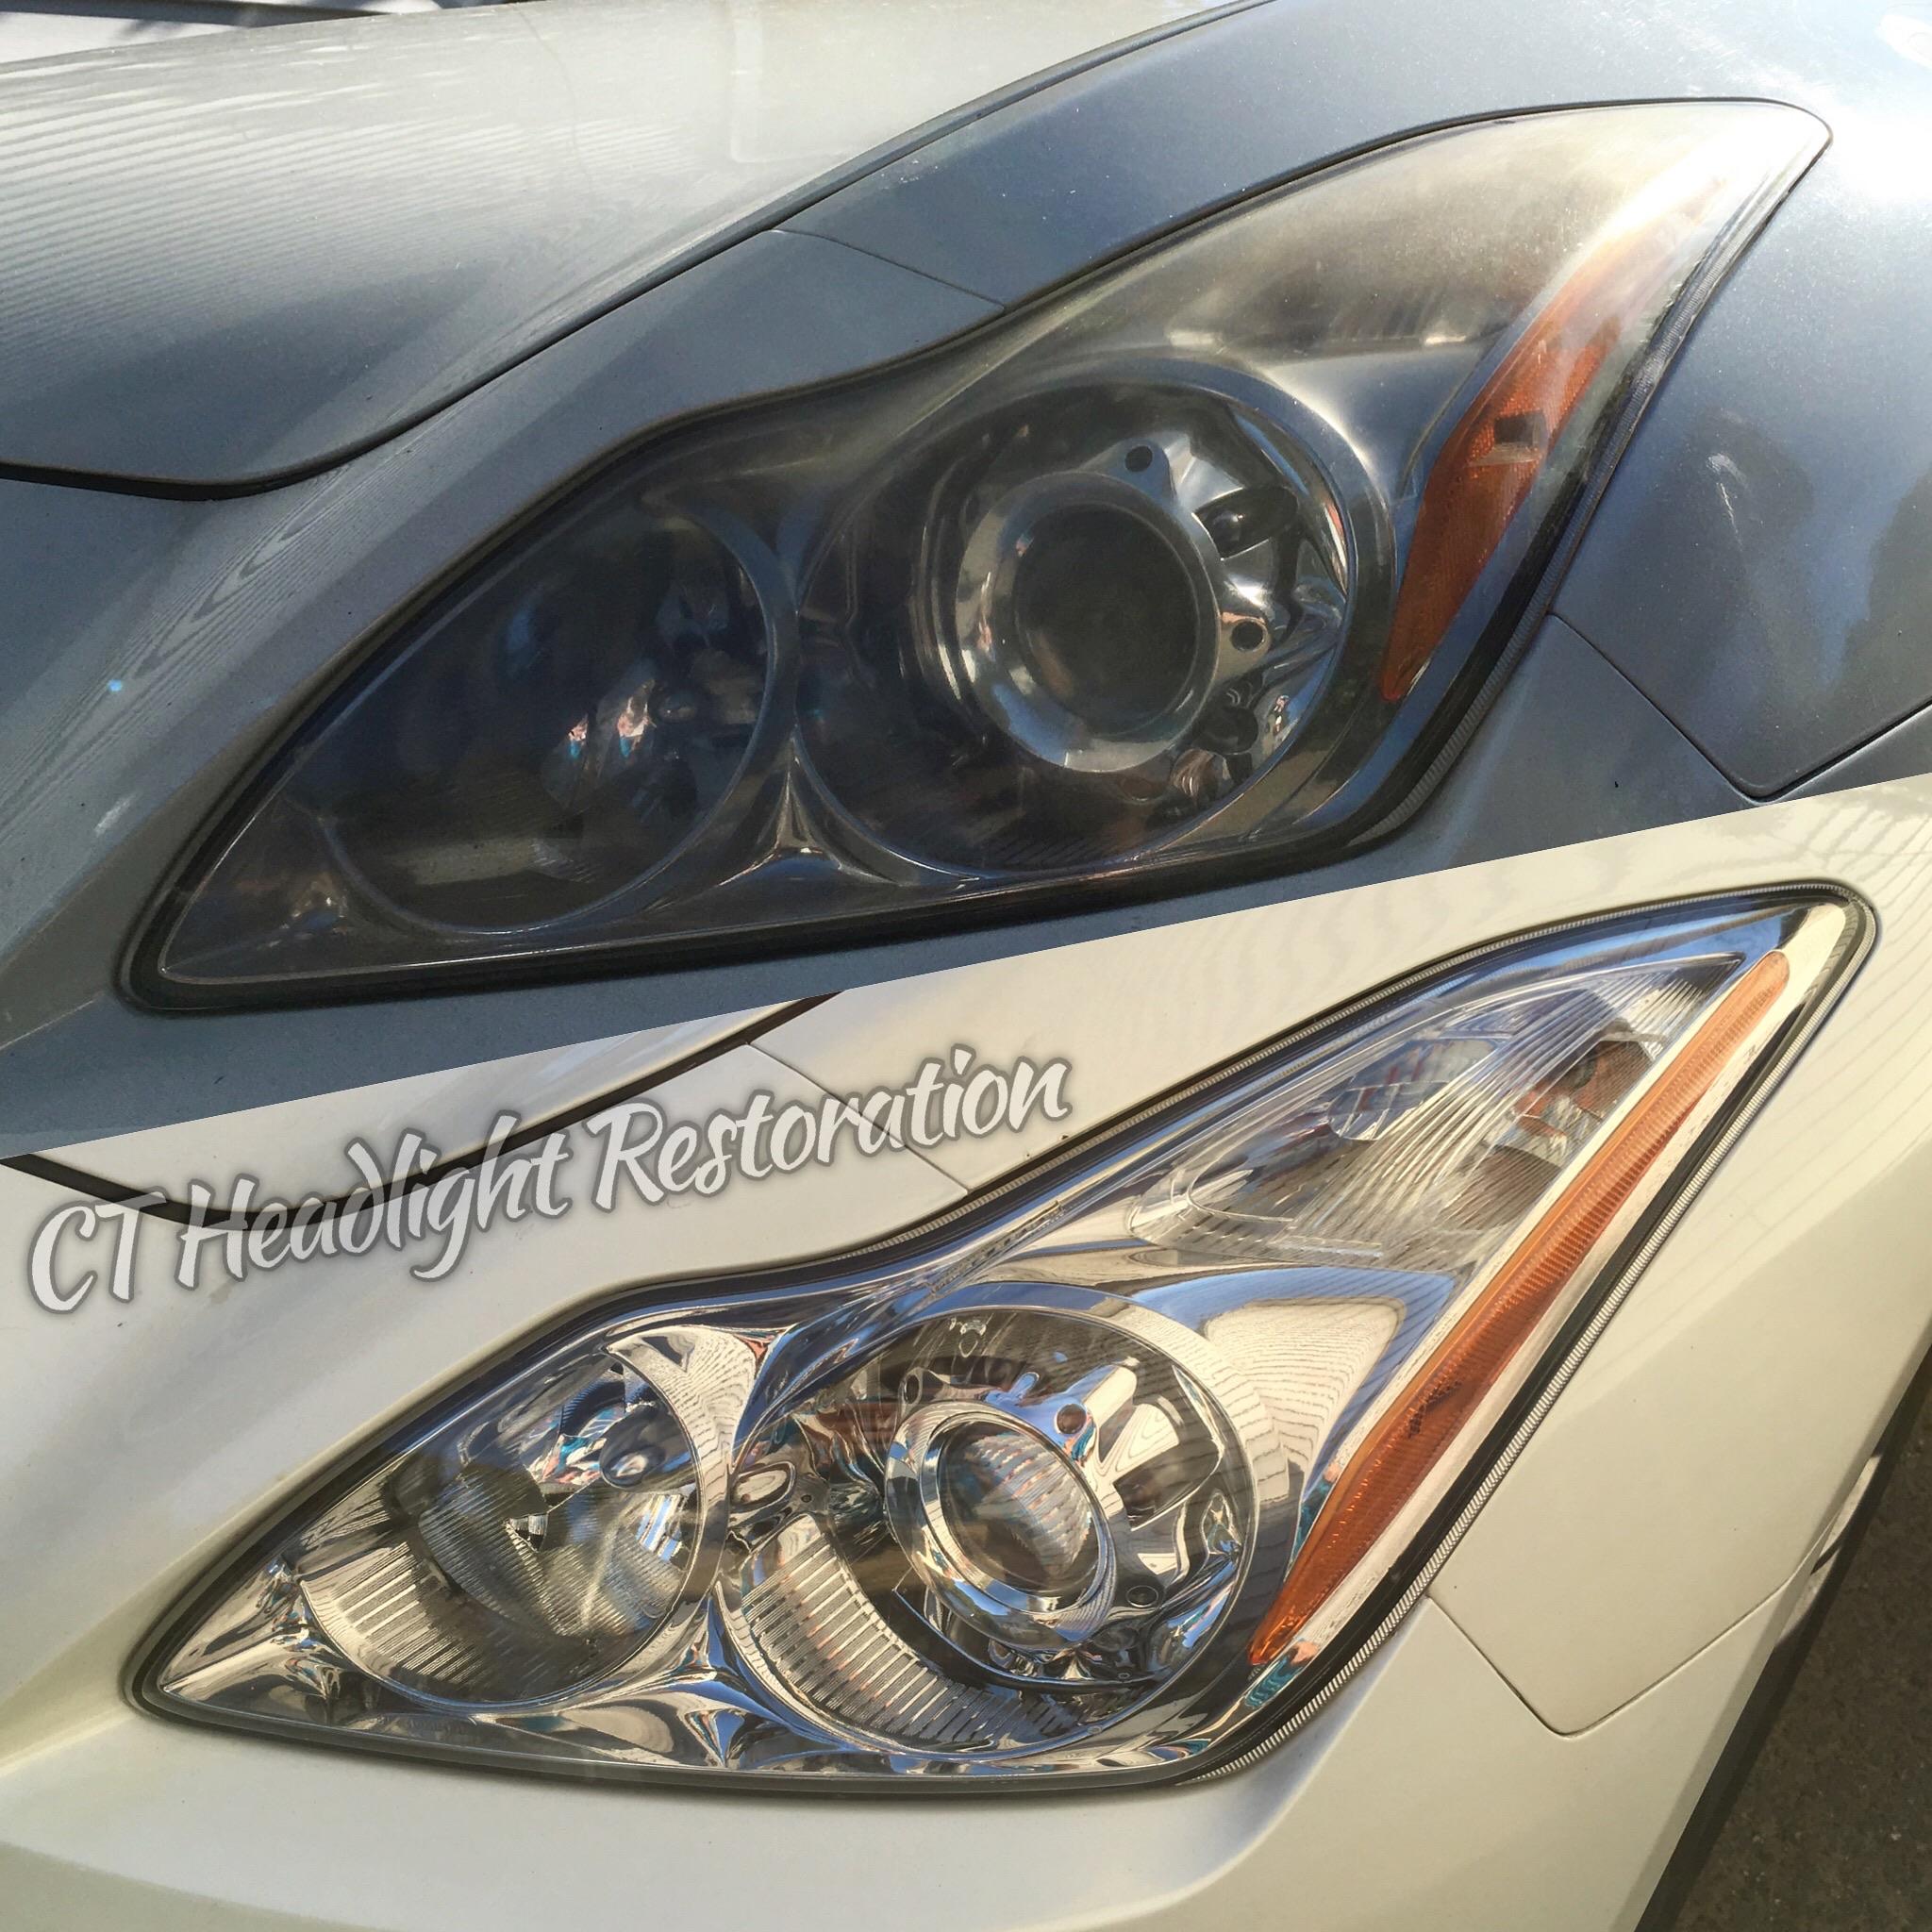 Infinity g37 Headlight Restoration.jpg